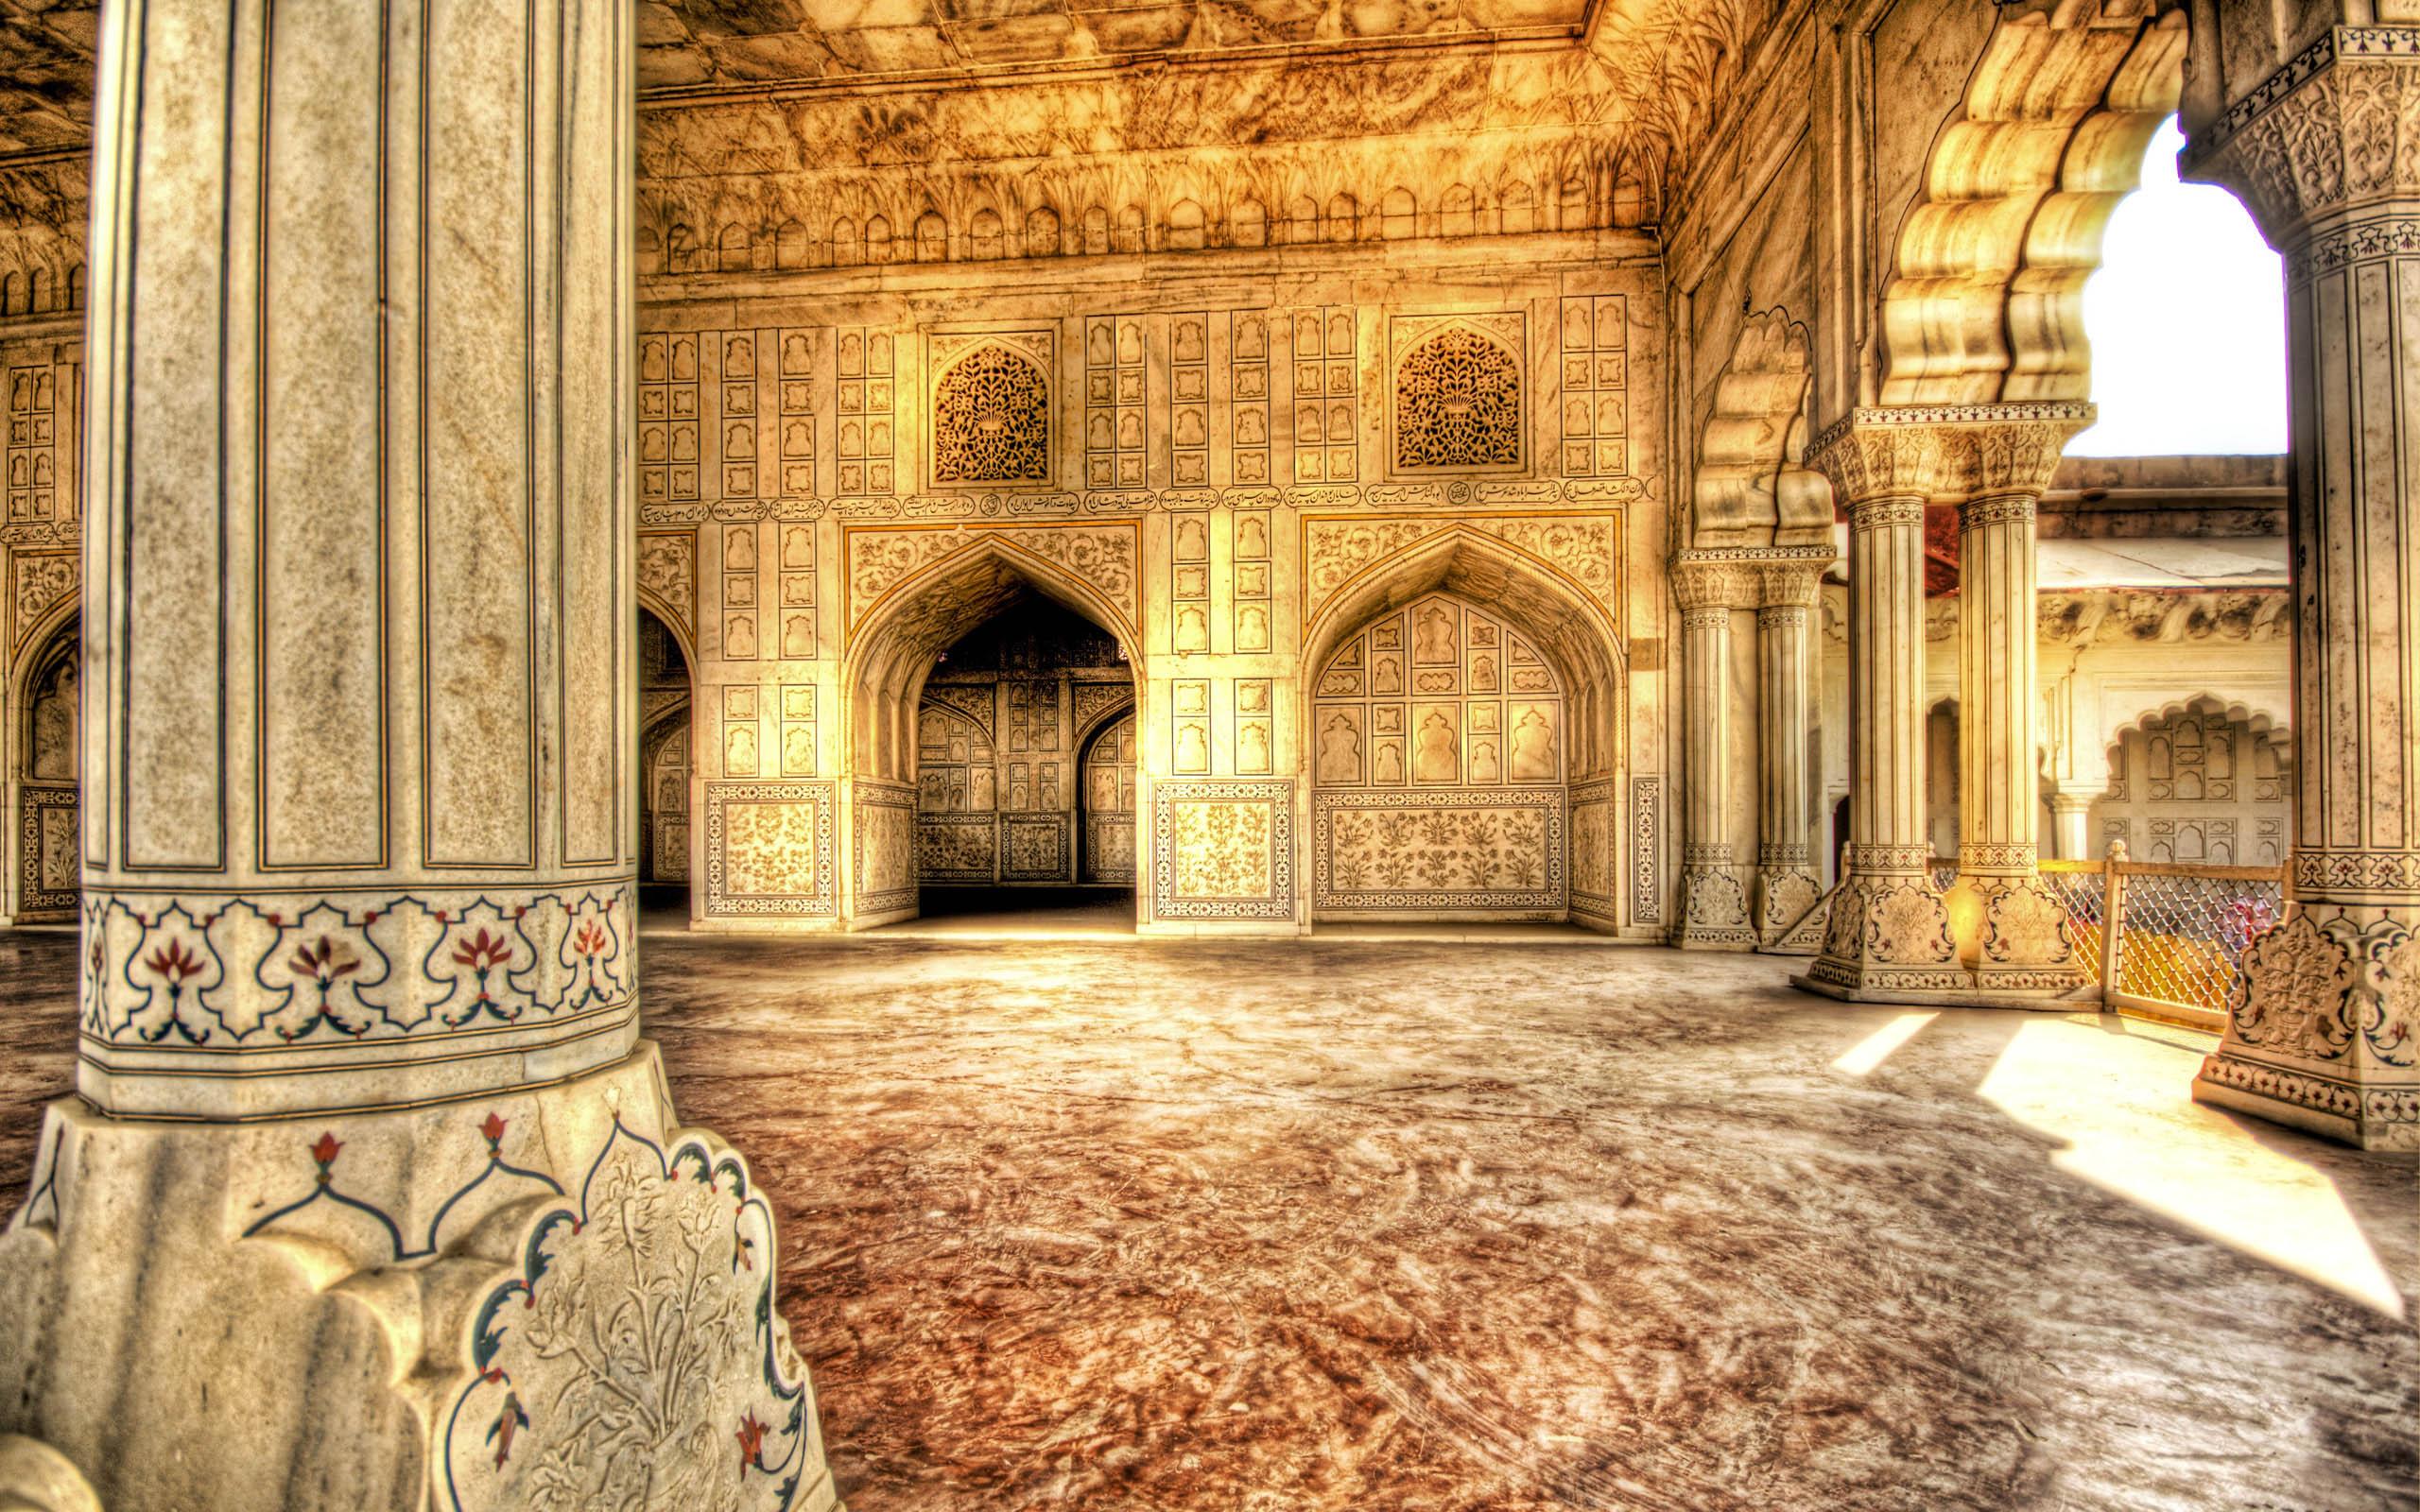 wallpaper interior design india photo - 6